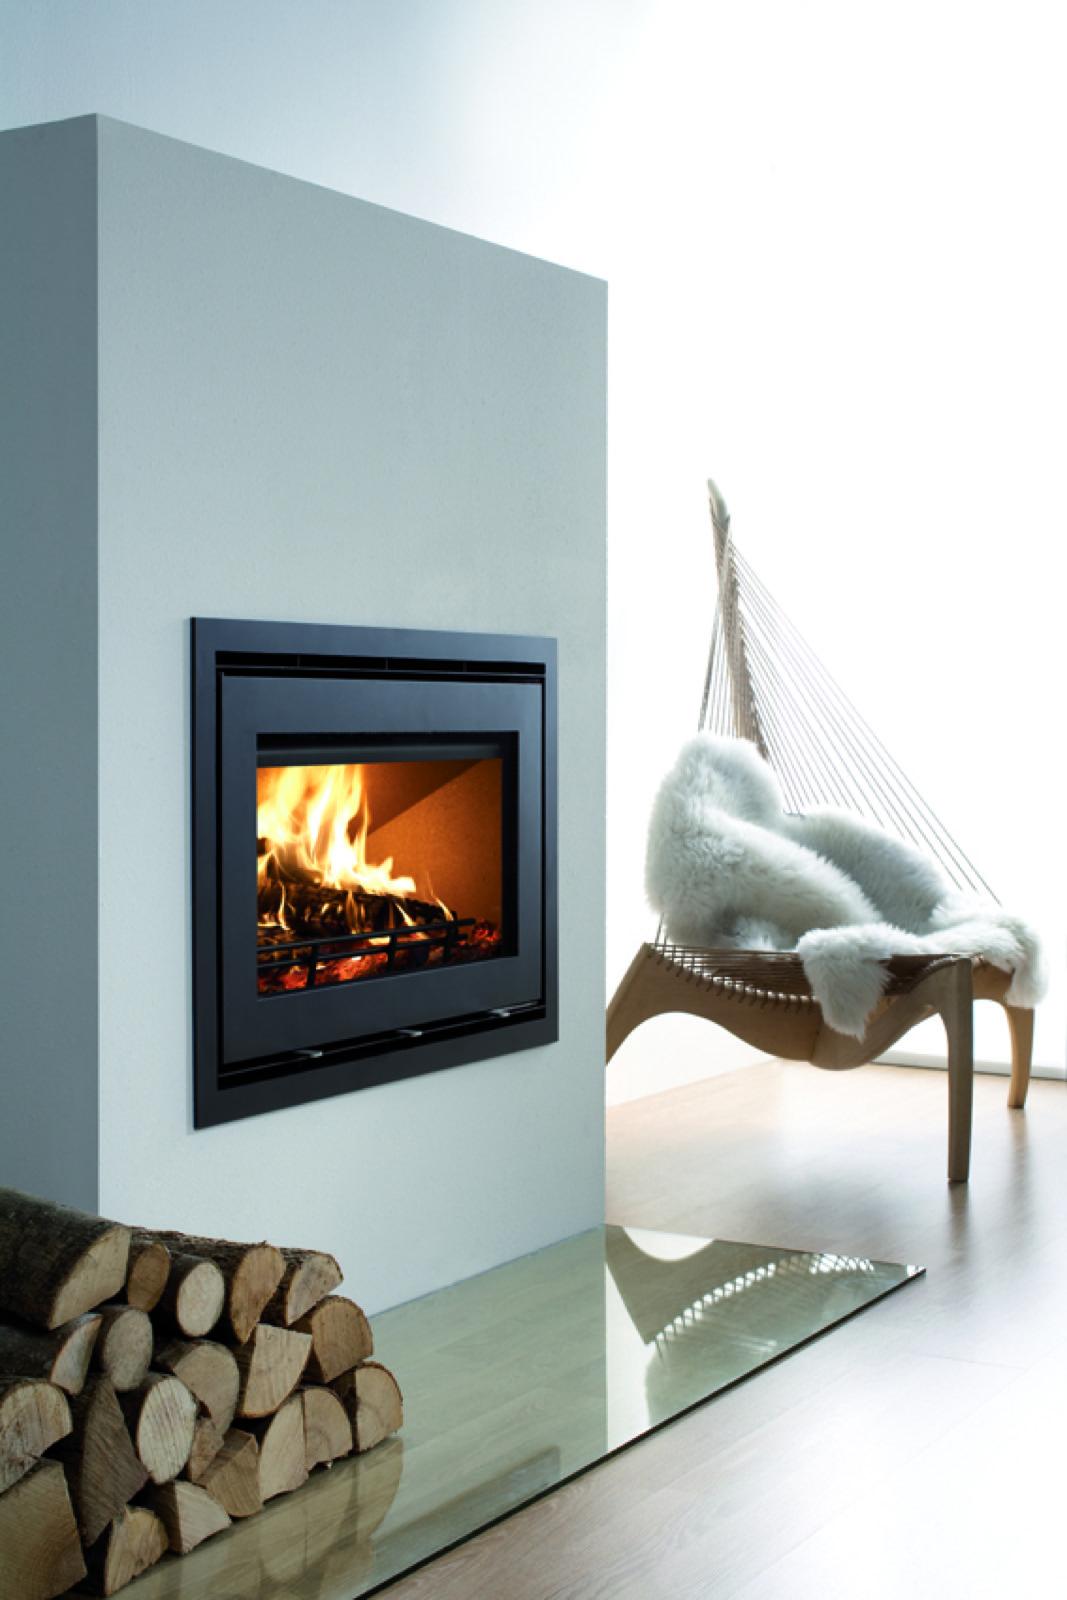 Westfire Uniq 32 Se Inset Wood Burning Stove With Narrow